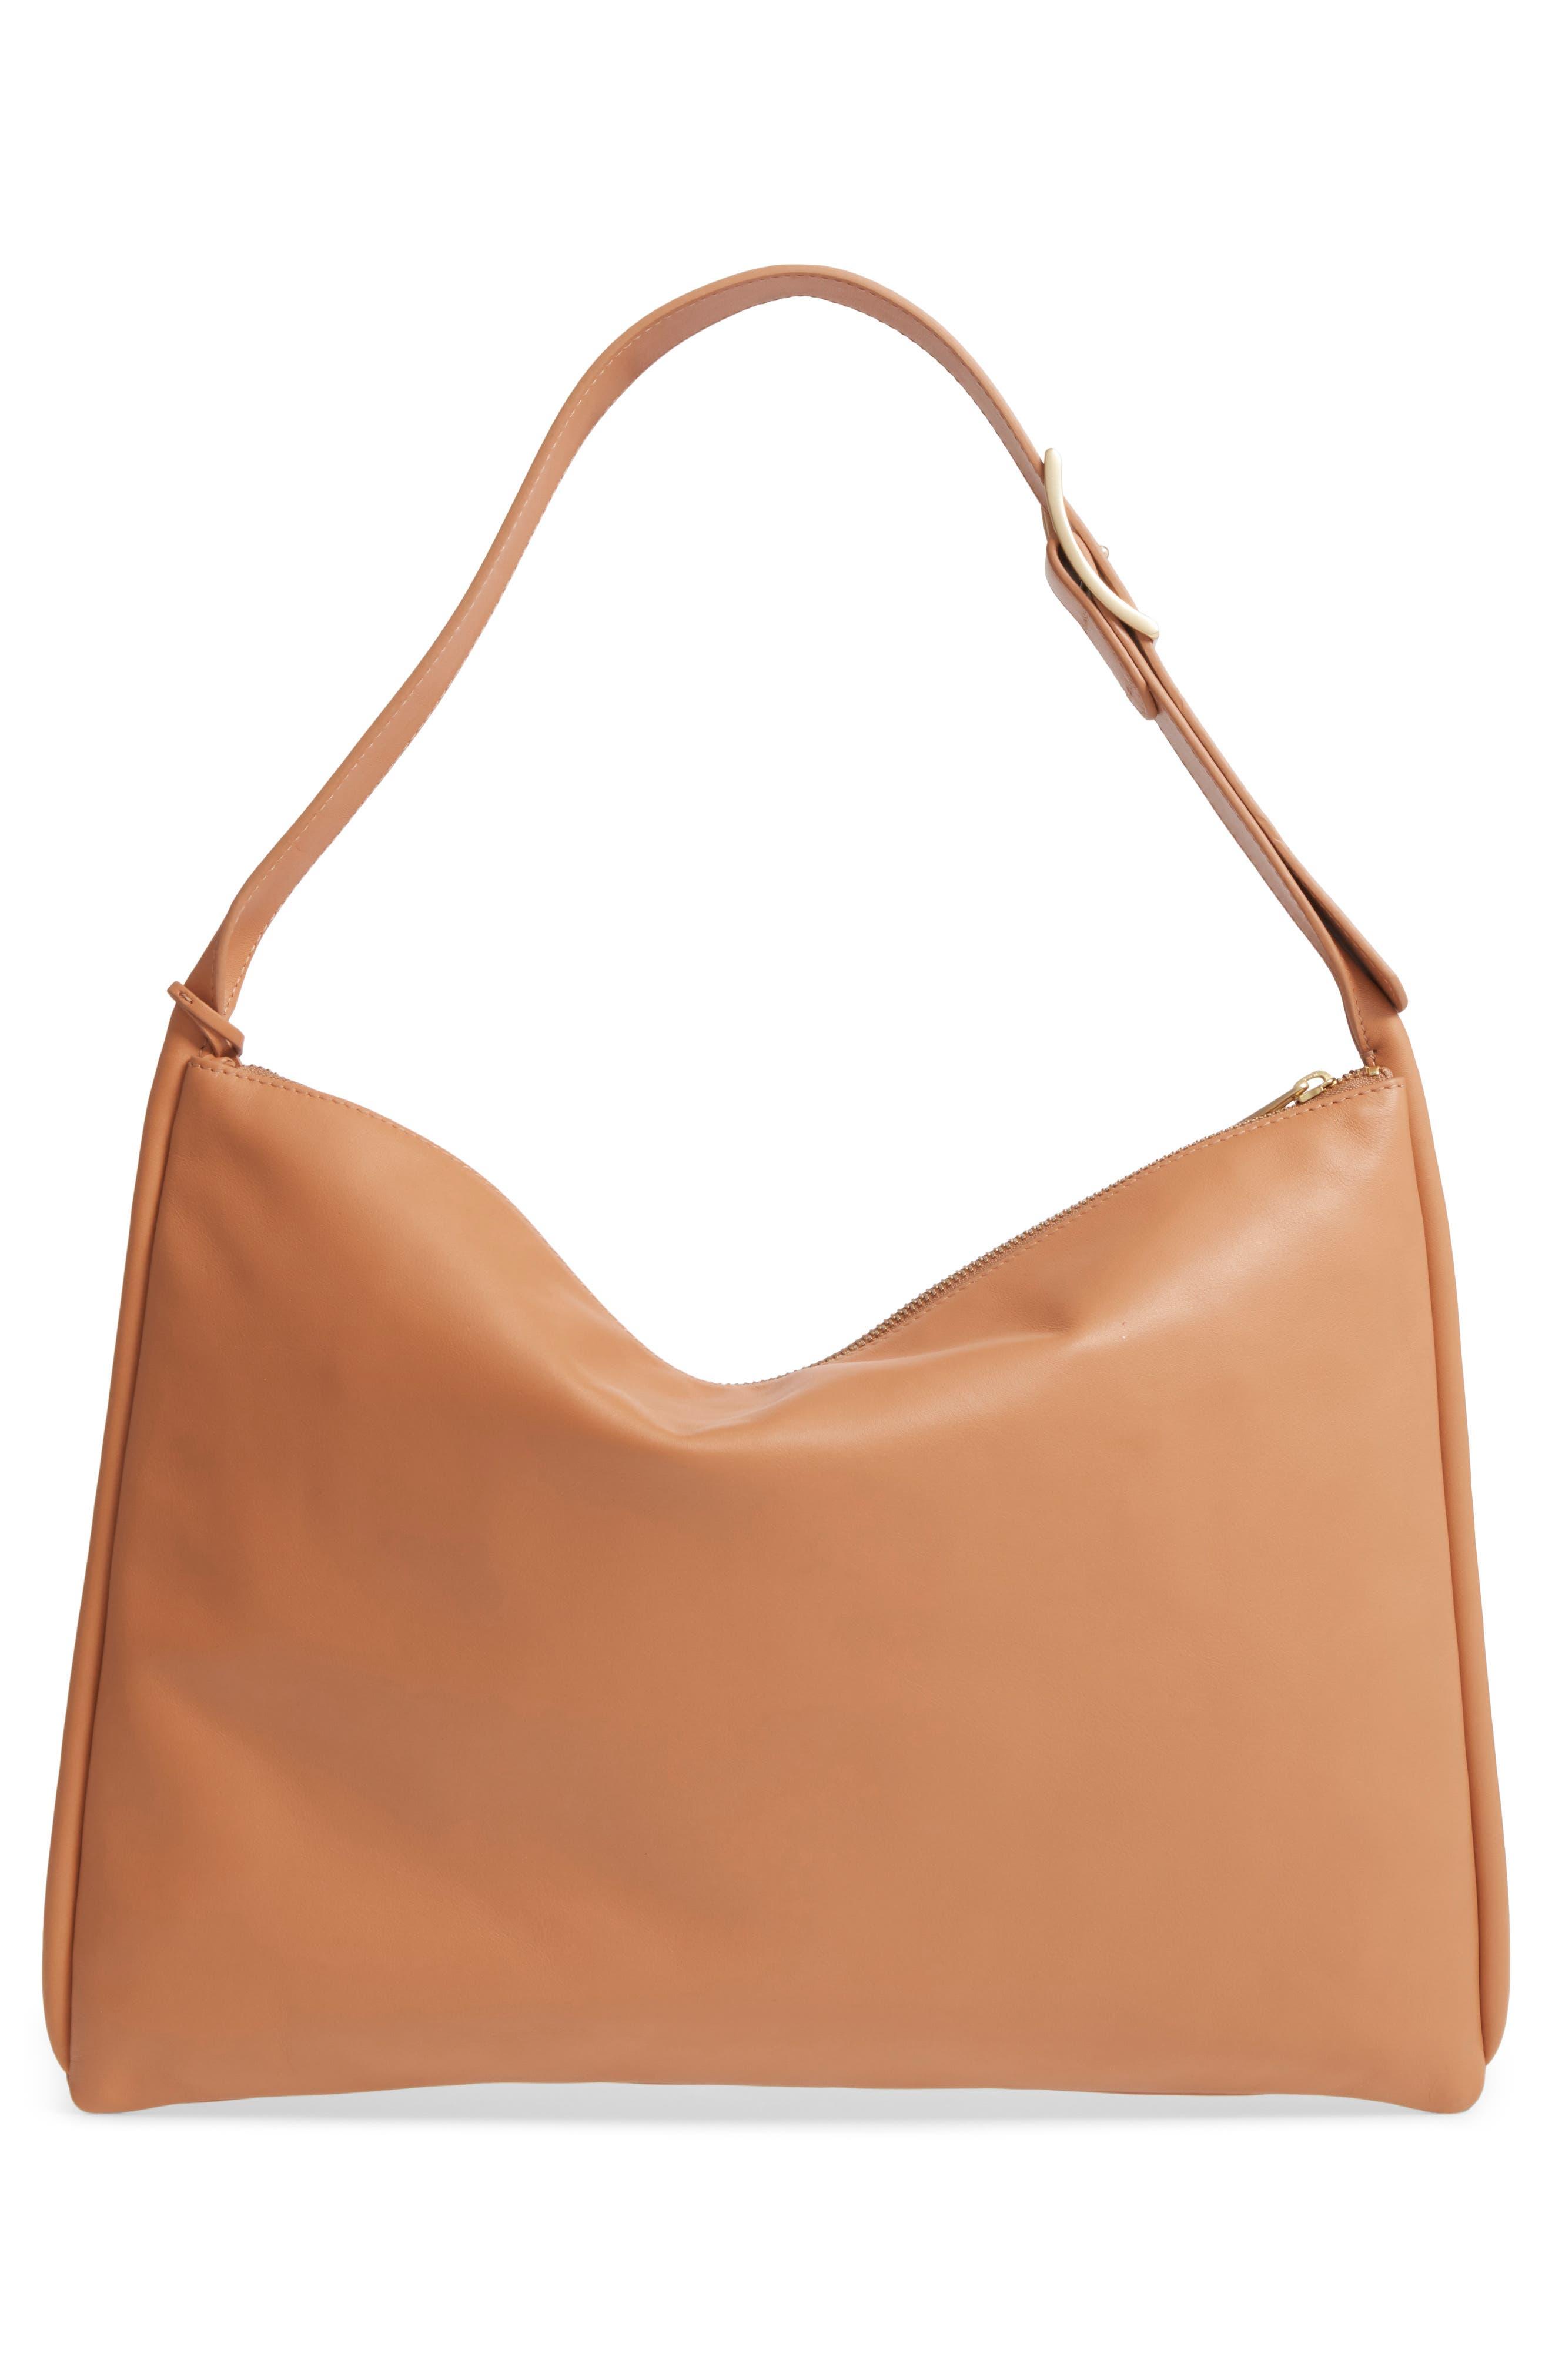 Anesa Leather Shoulder Bag,                             Alternate thumbnail 3, color,                             Tan